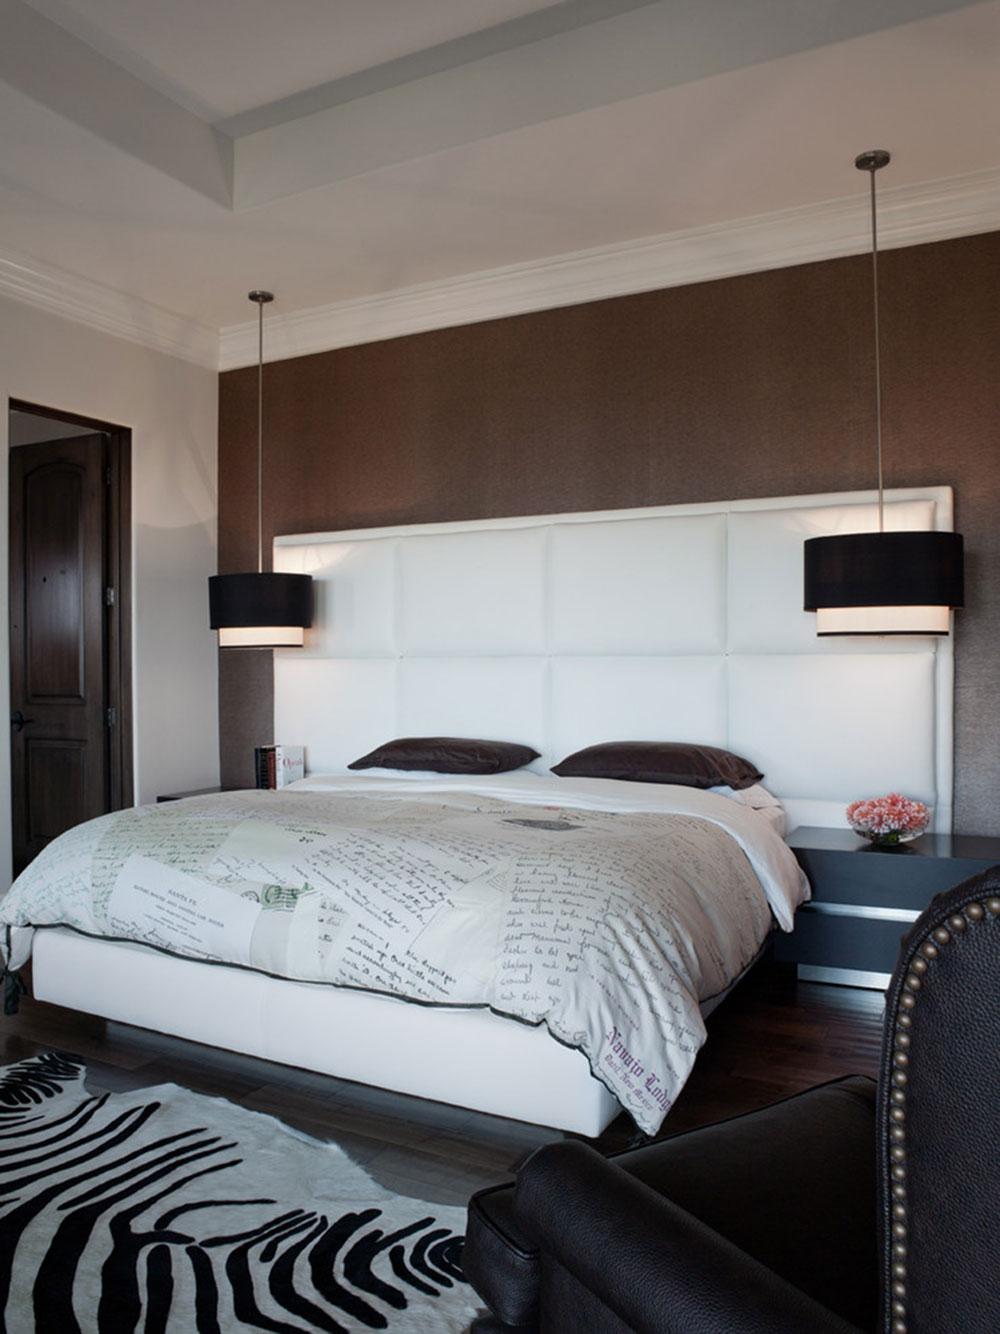 Bedroom-lighting-tips-and-pictures-5 bedroom-lighting tips and pictures